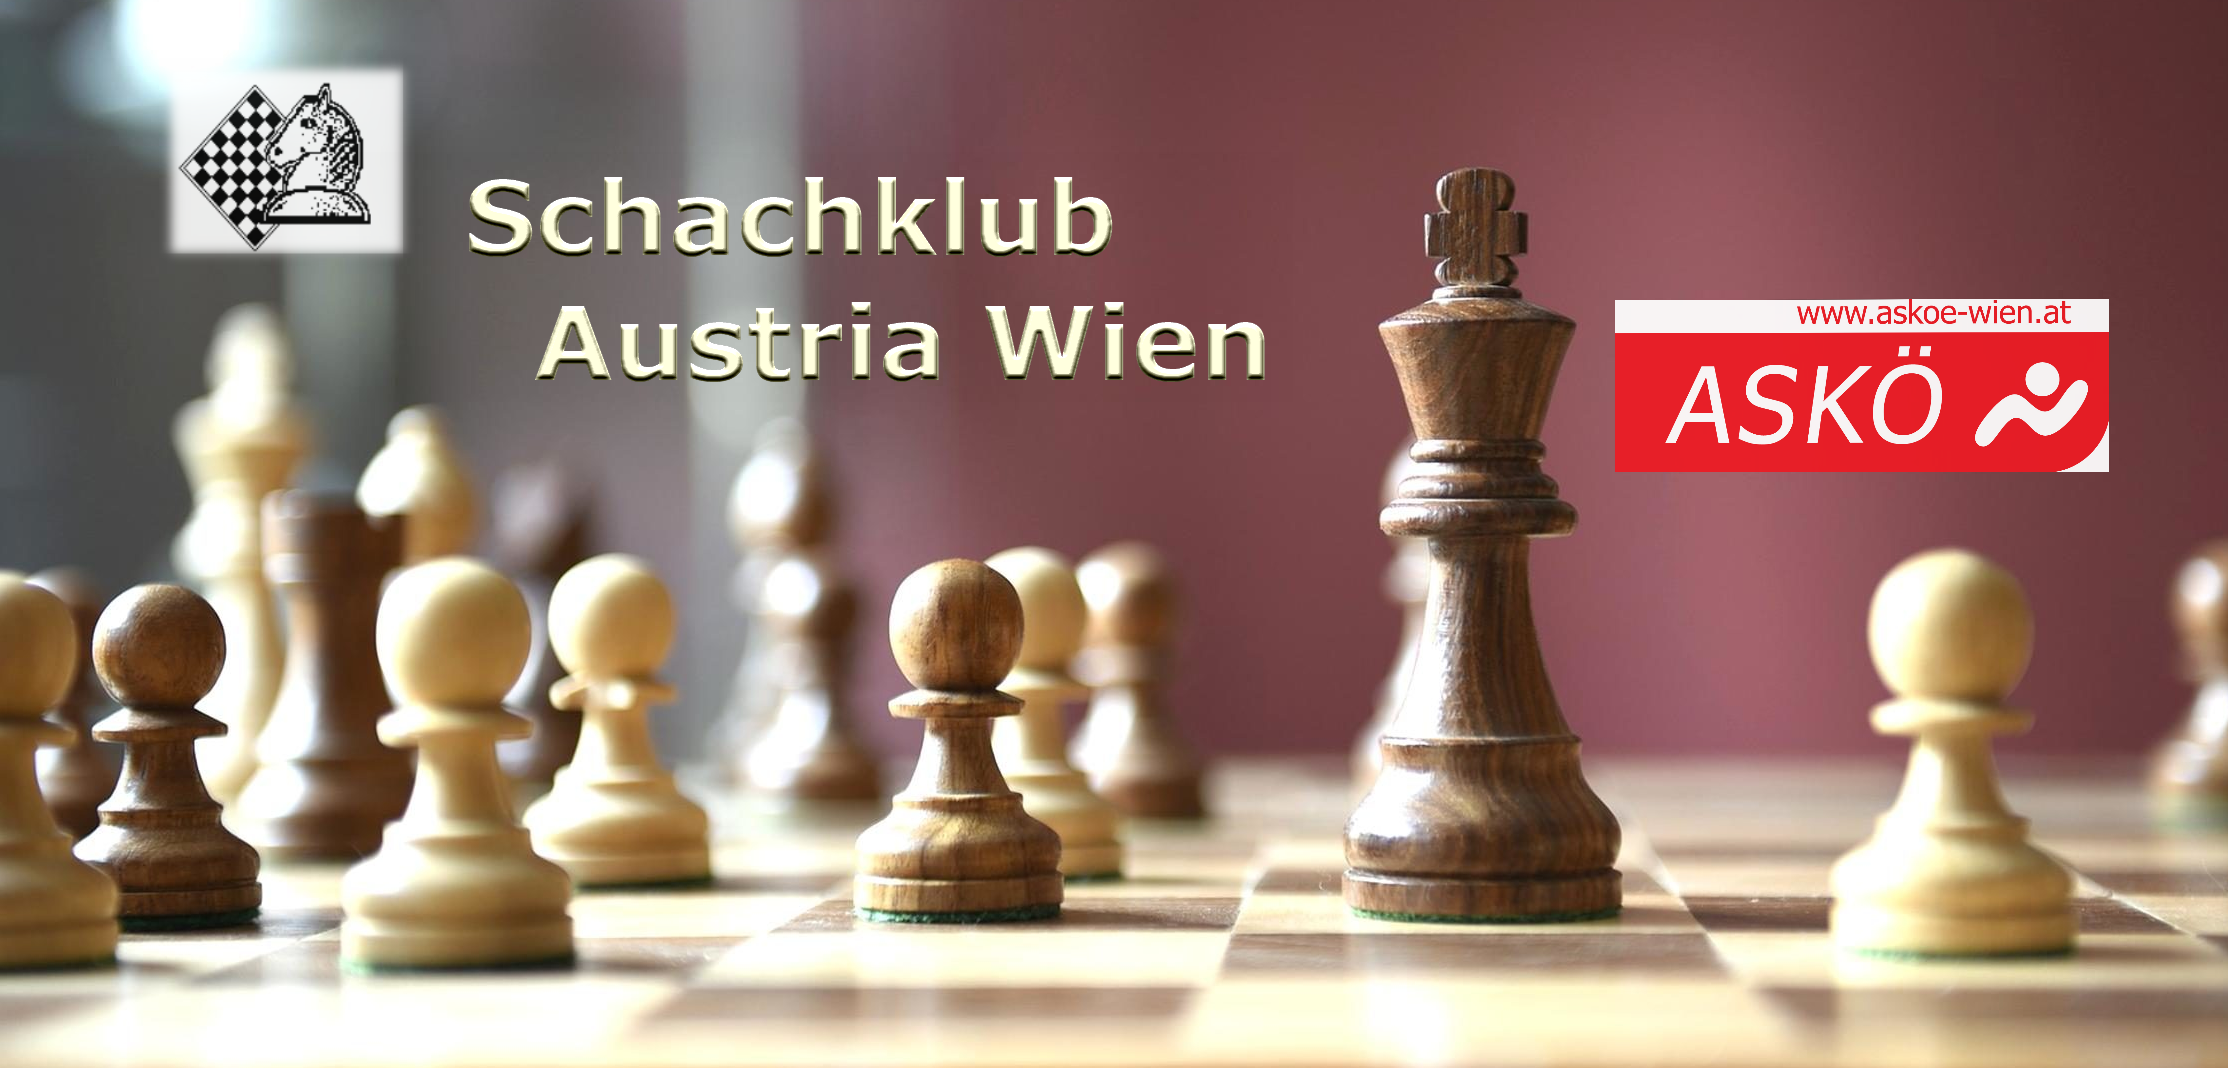 Schachklub Austria Wien